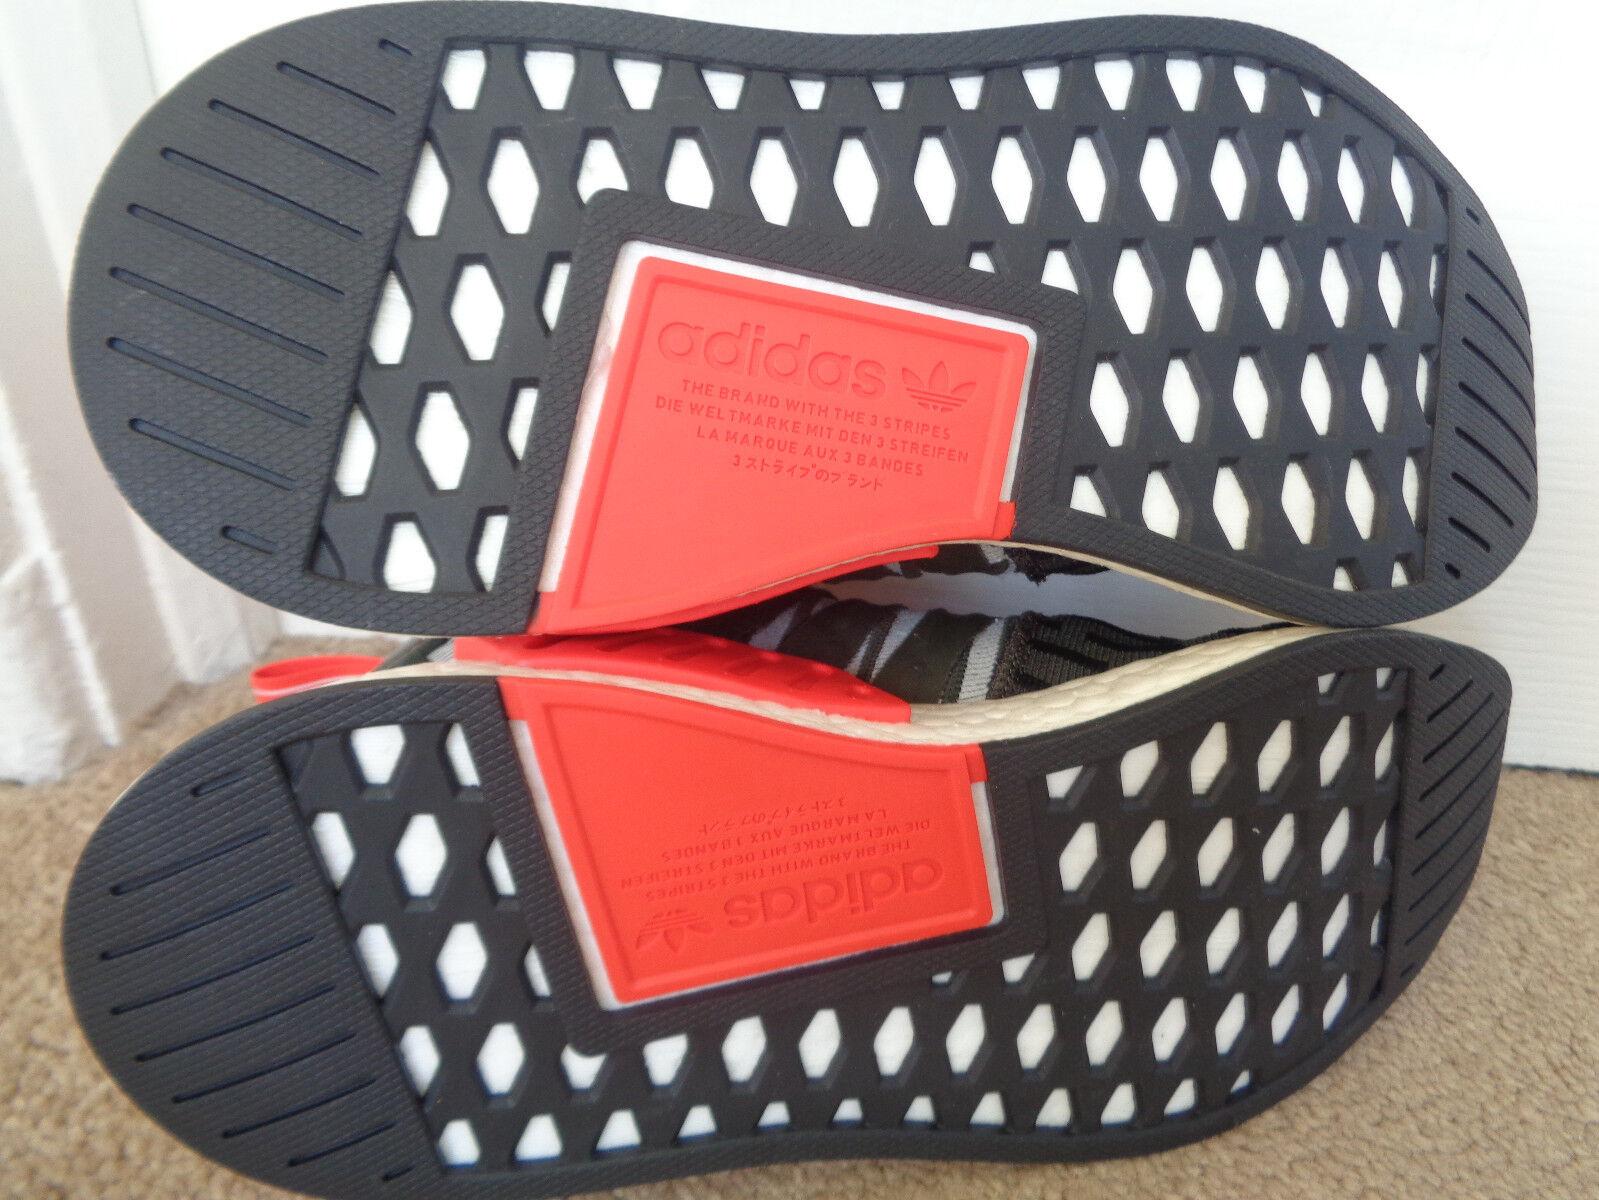 New Balance Cm878 Sneaker Low Herren Weiß Schuhe Bestellen